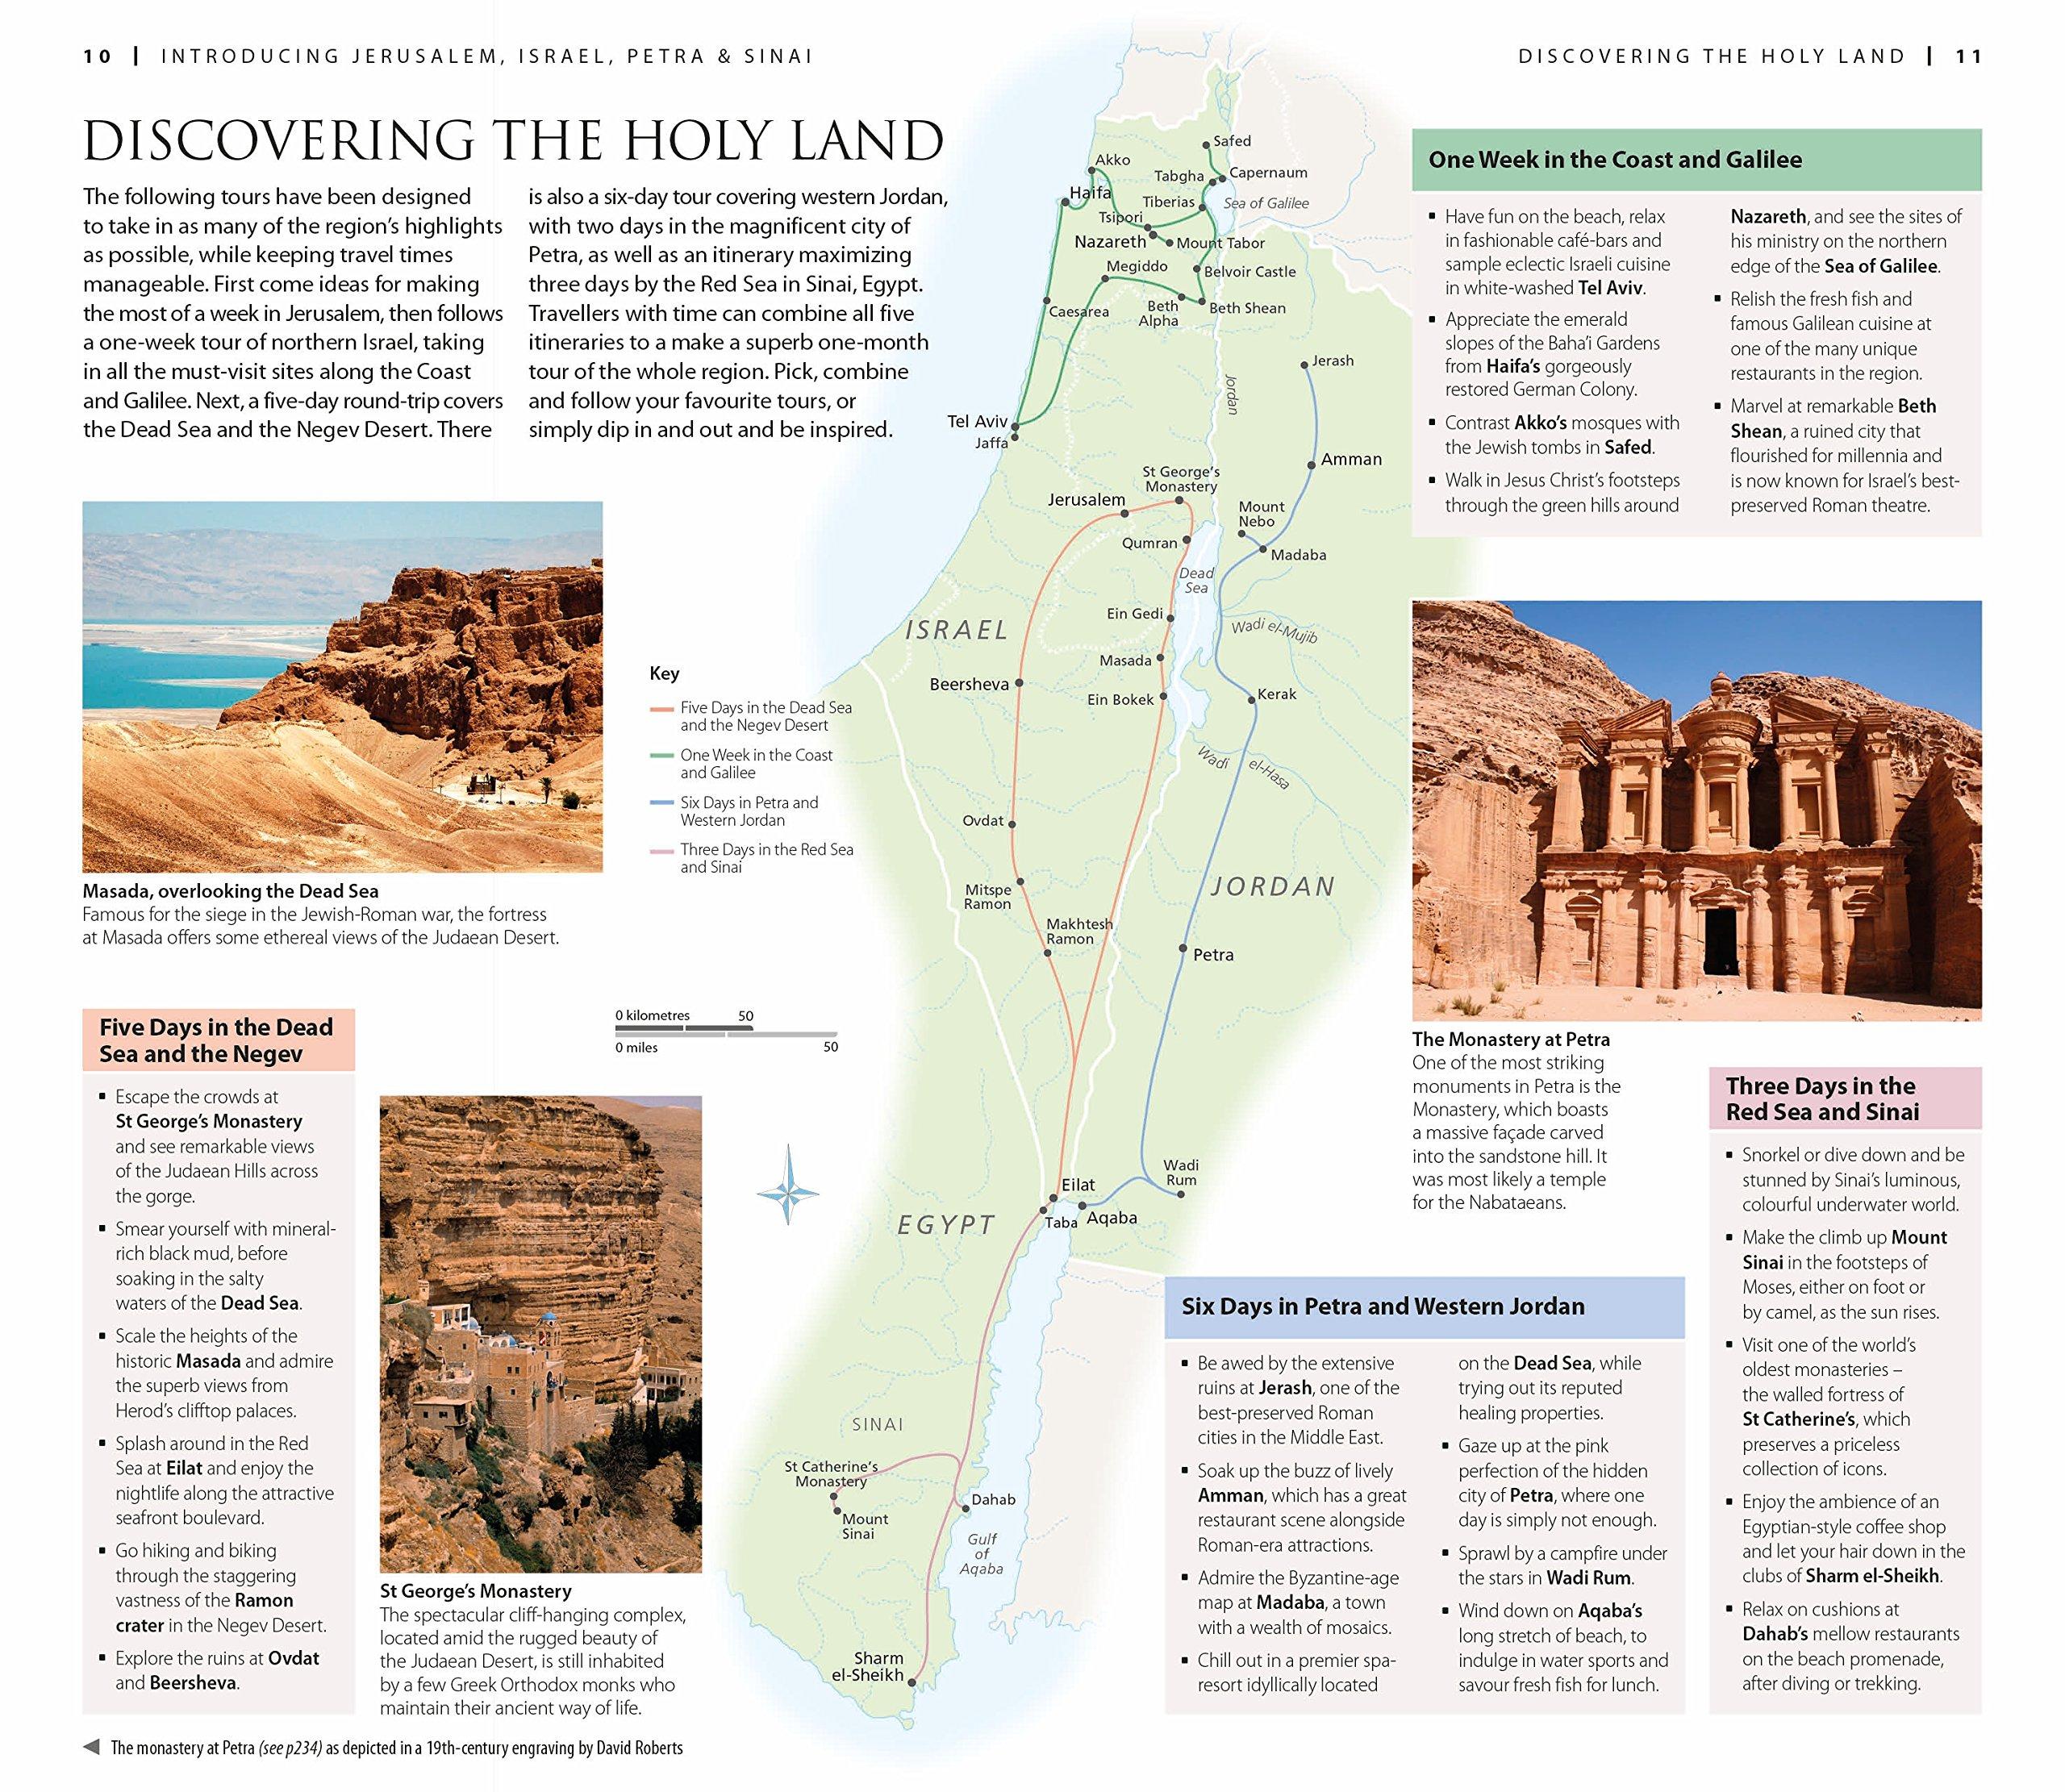 DK Eyewitness Travel Guide: Jerusalem, Israel, Petra & Sinai: DK ...